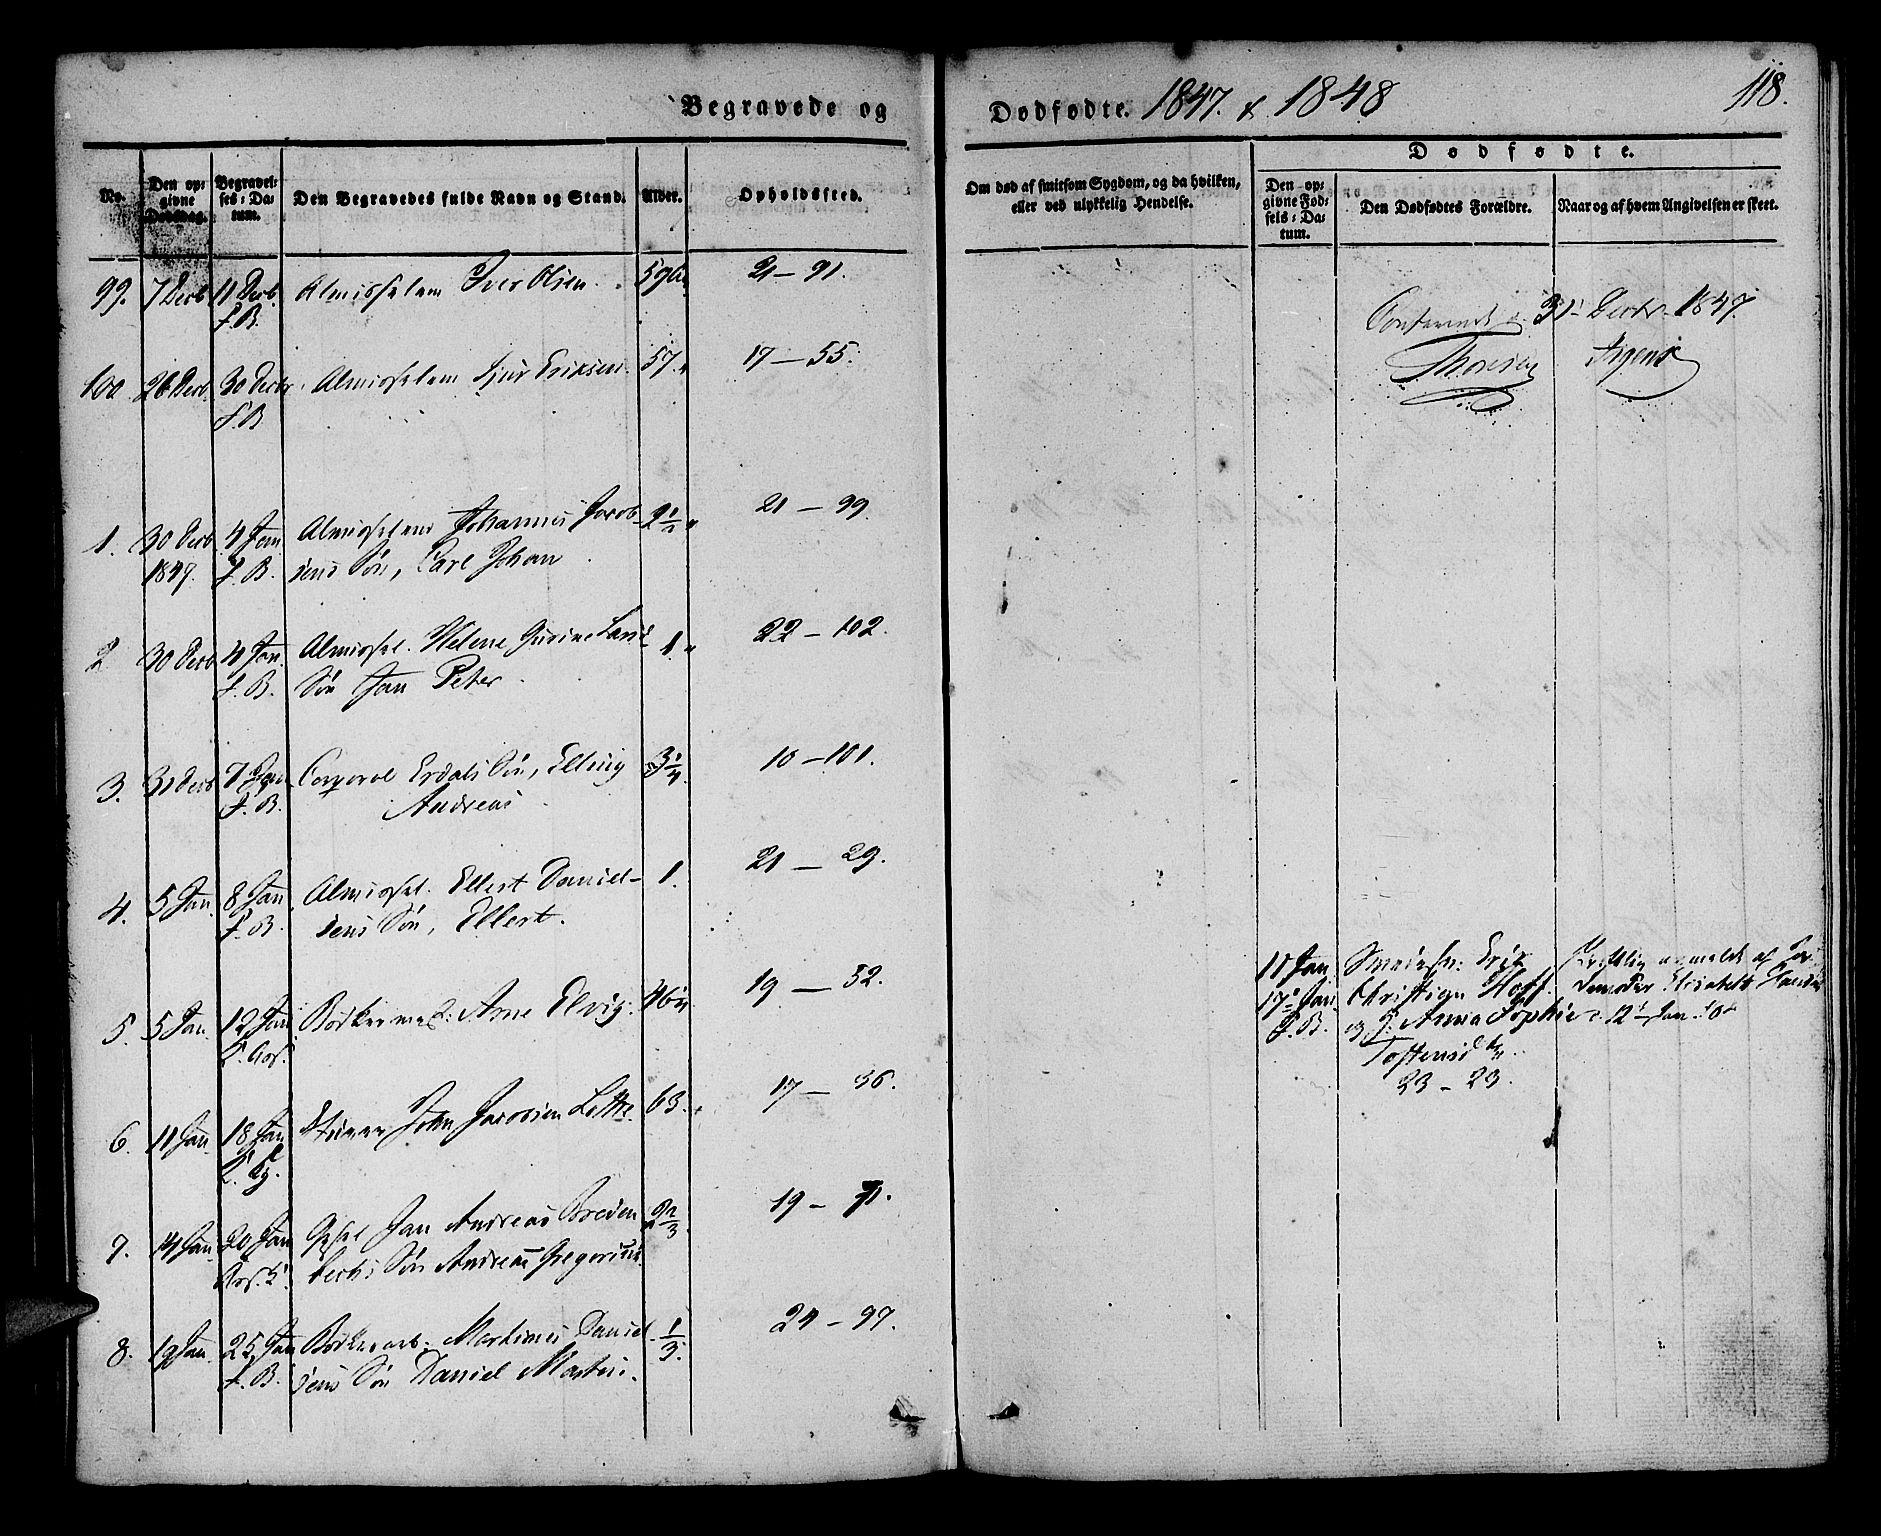 SAB, Korskirken Sokneprestembete, H/Haa/L0043: Ministerialbok nr. E 1, 1834-1848, s. 118